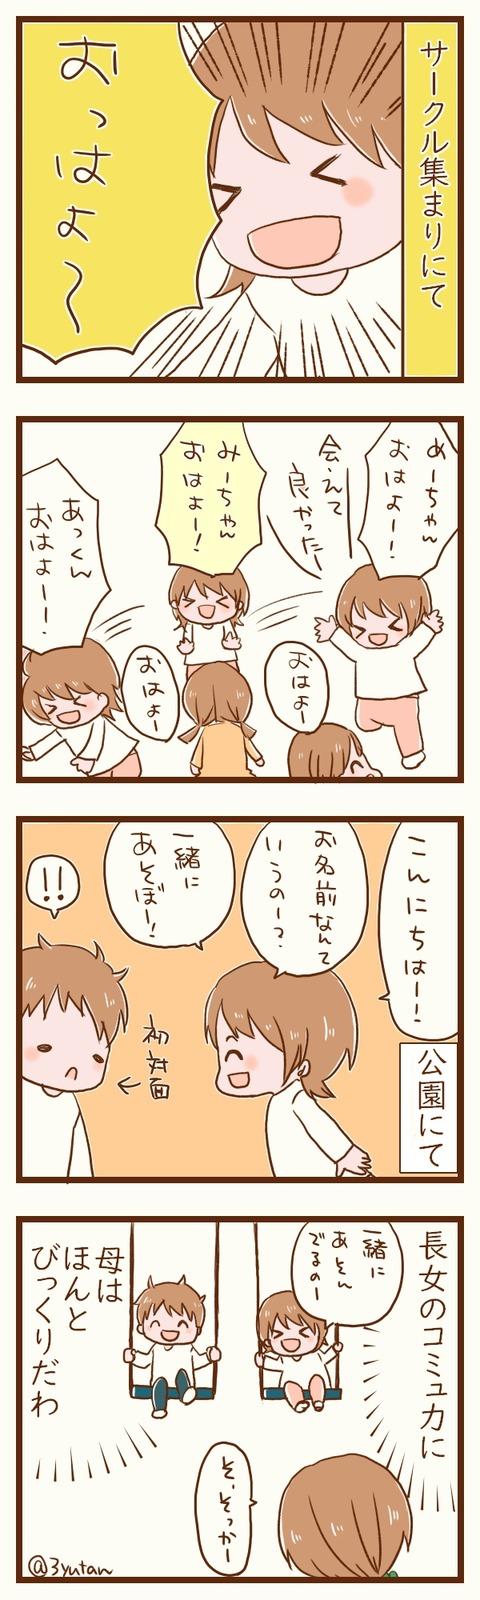 musume19